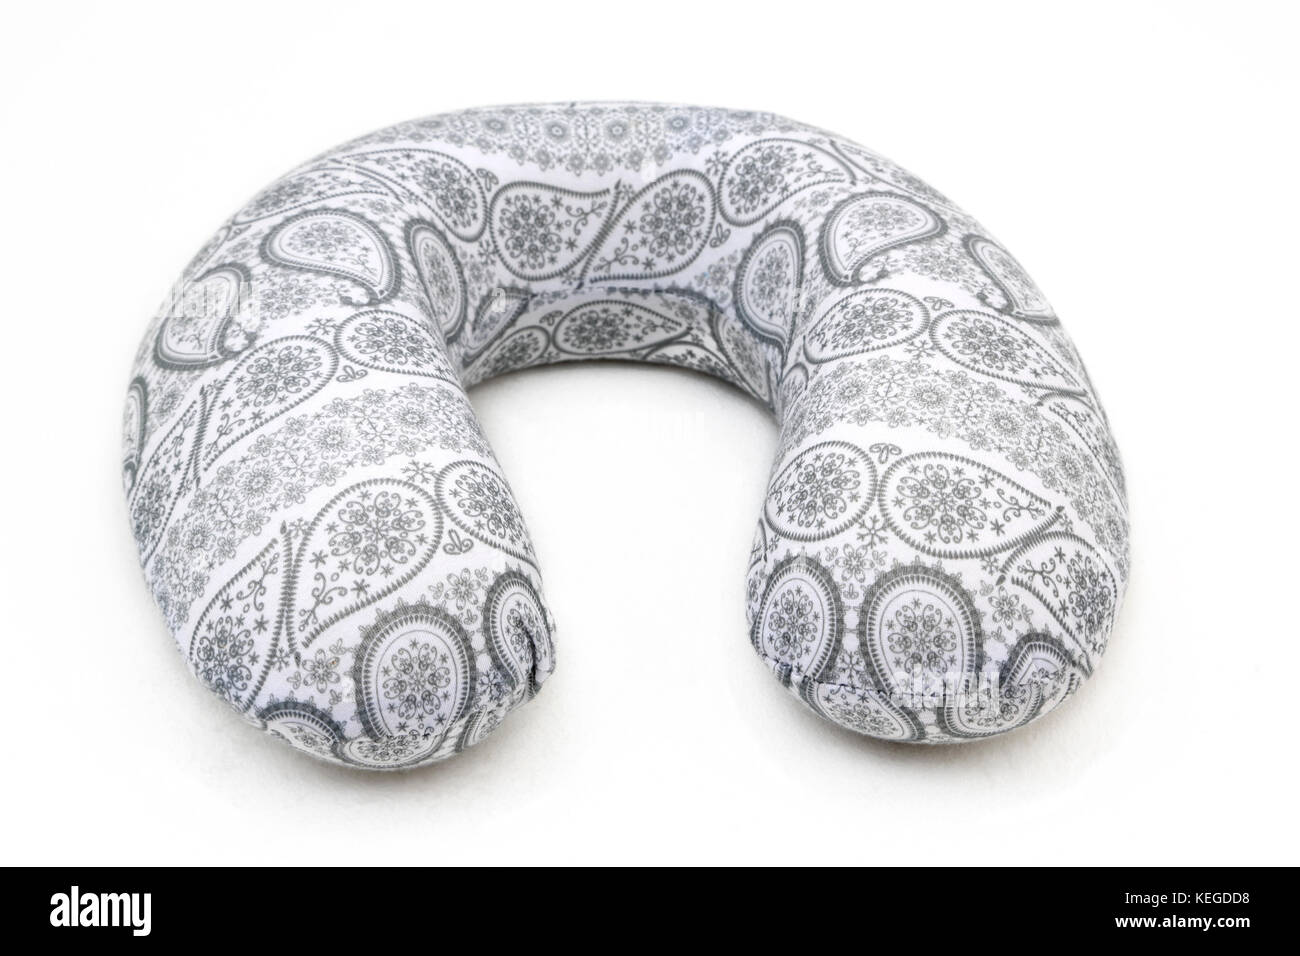 Neck Cushion Imágenes De Stock & Neck Cushion Fotos De Stock - Alamy